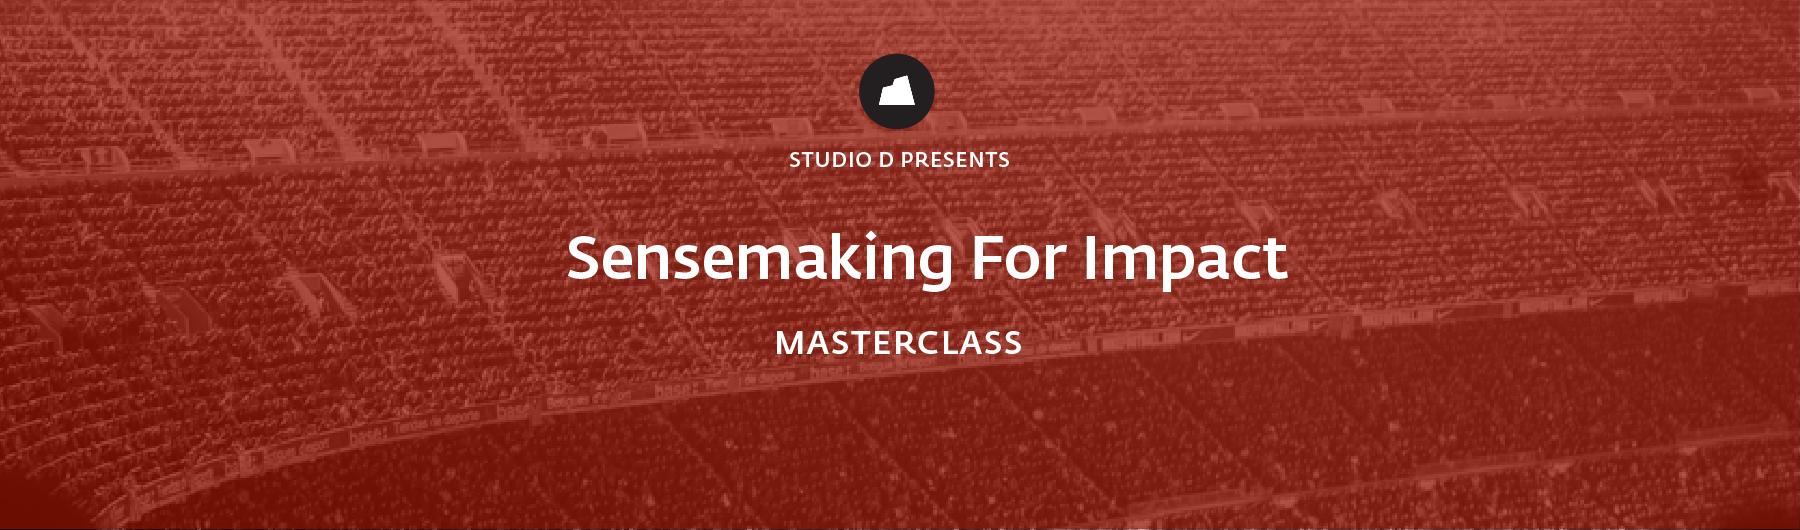 Sensemaking For Impact Masterclass, 6 April 2020, Munich